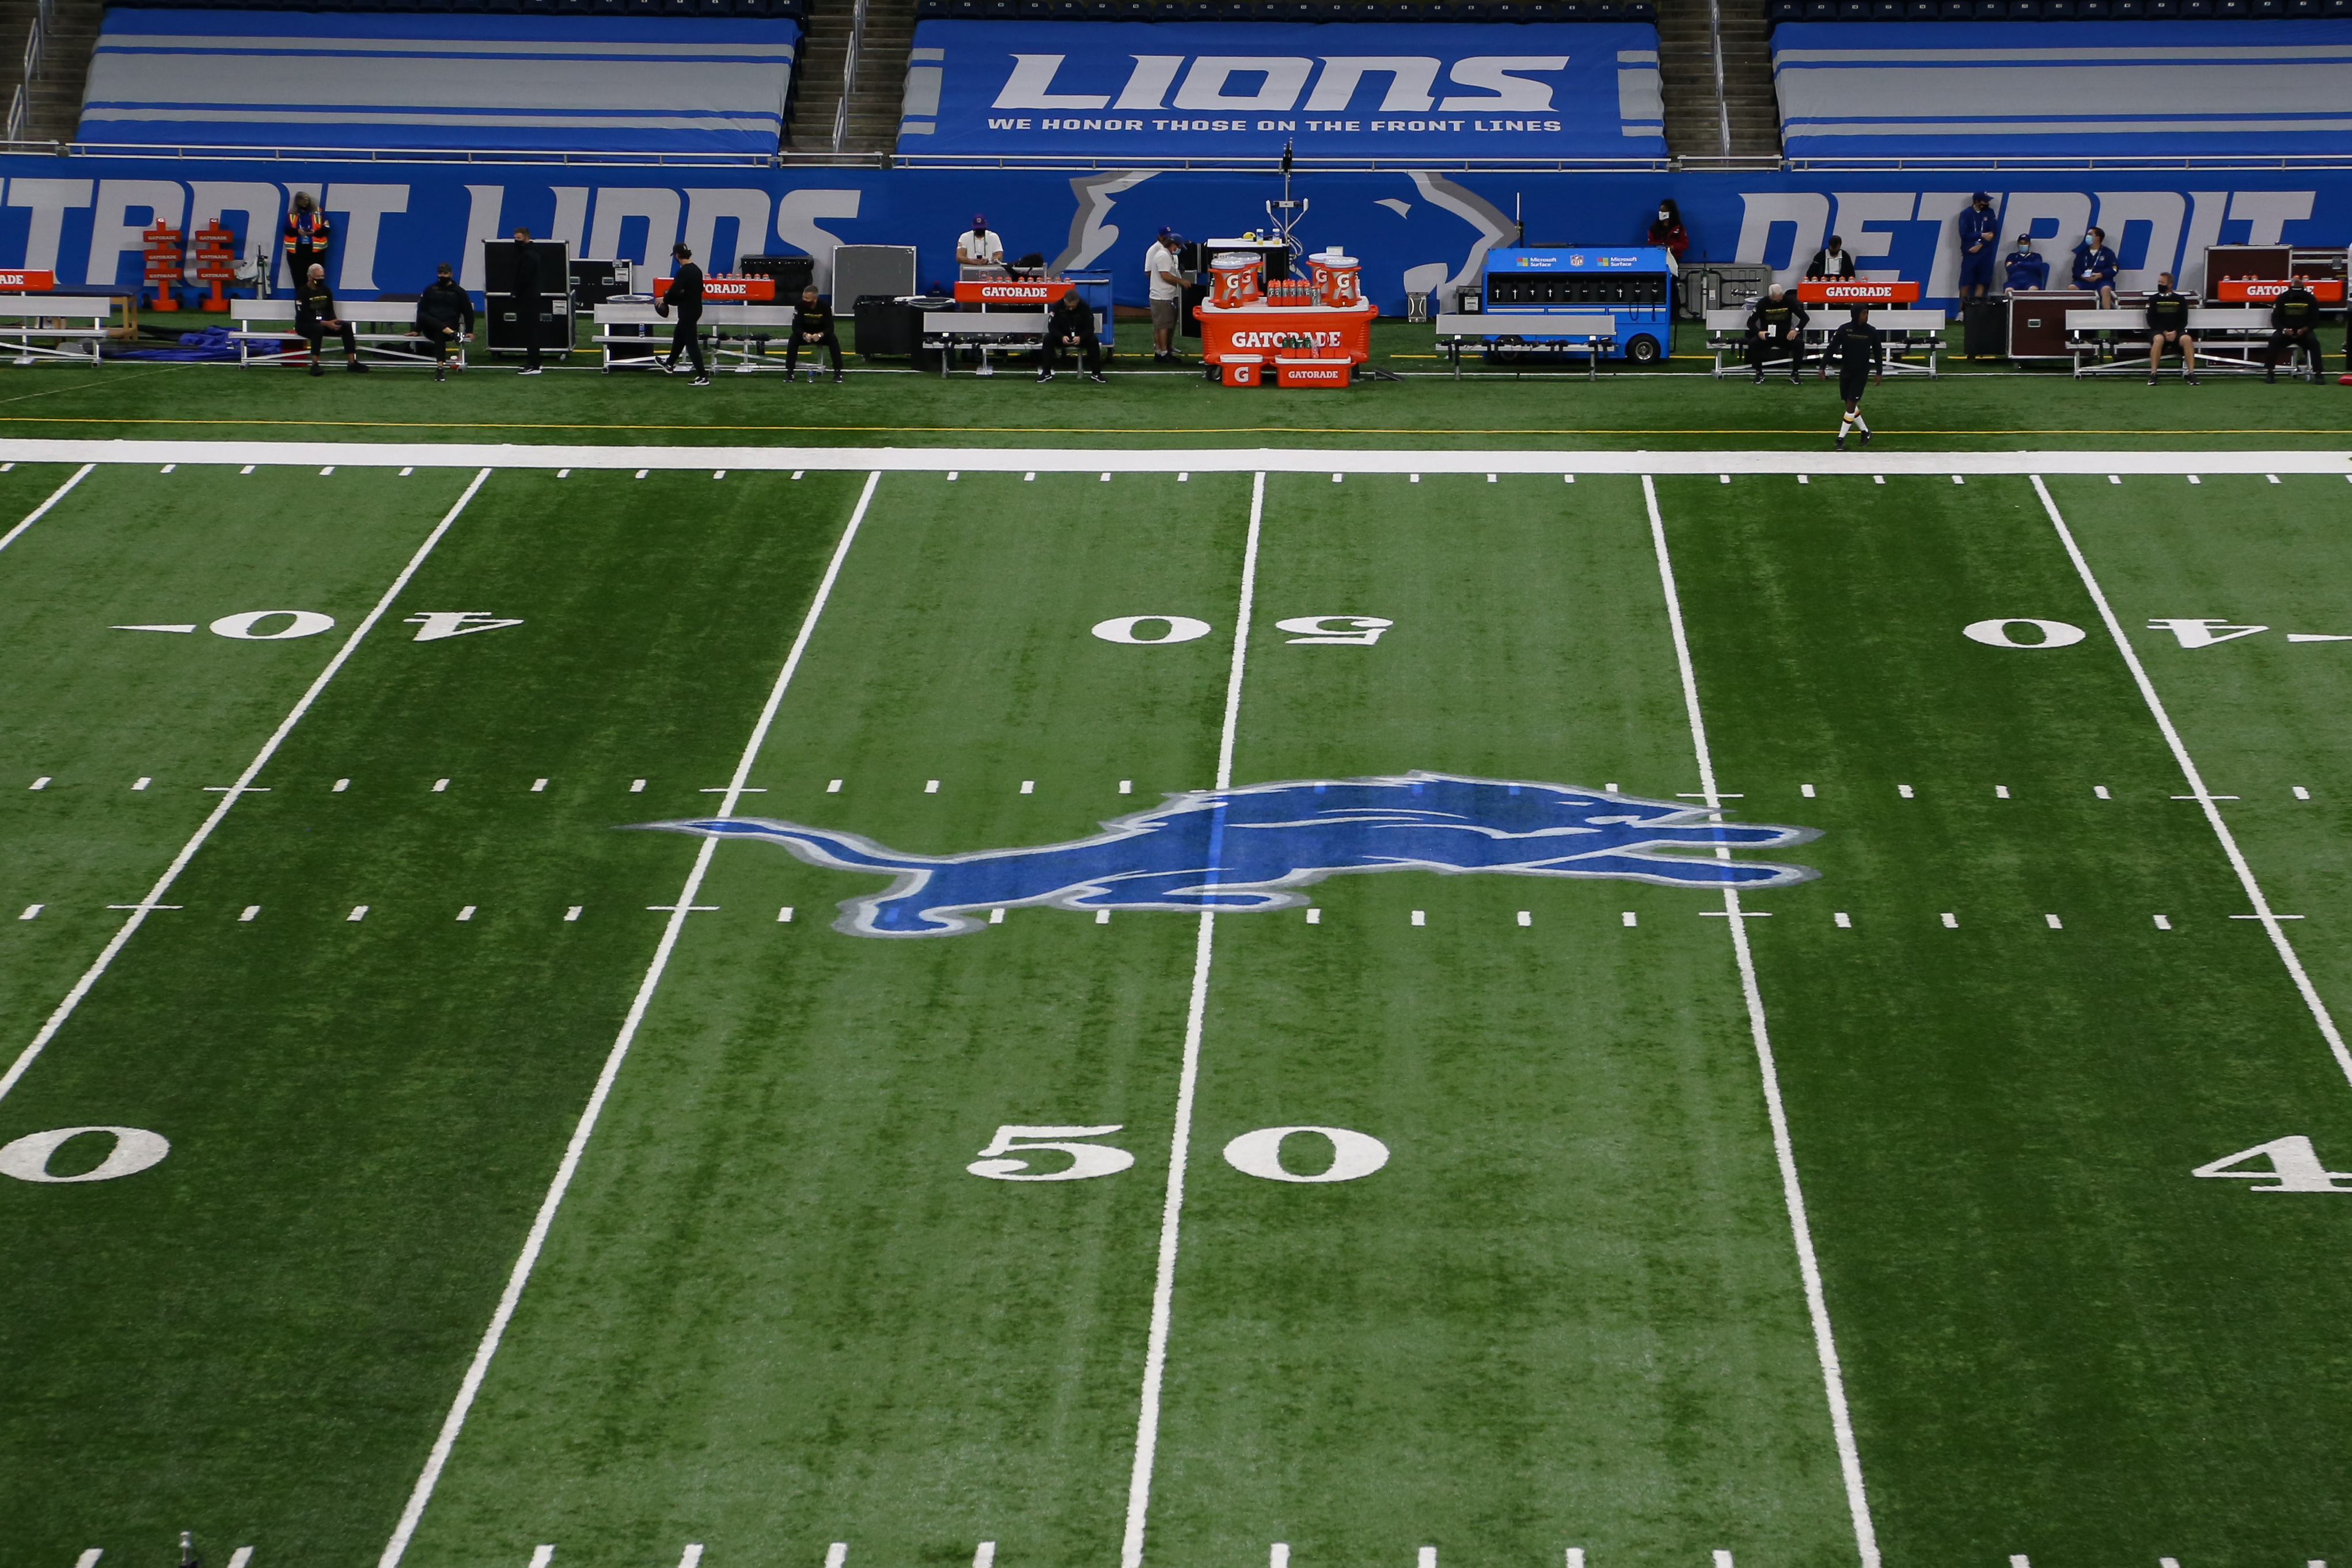 NFL: NOV 15 Washington Football Team at Lions